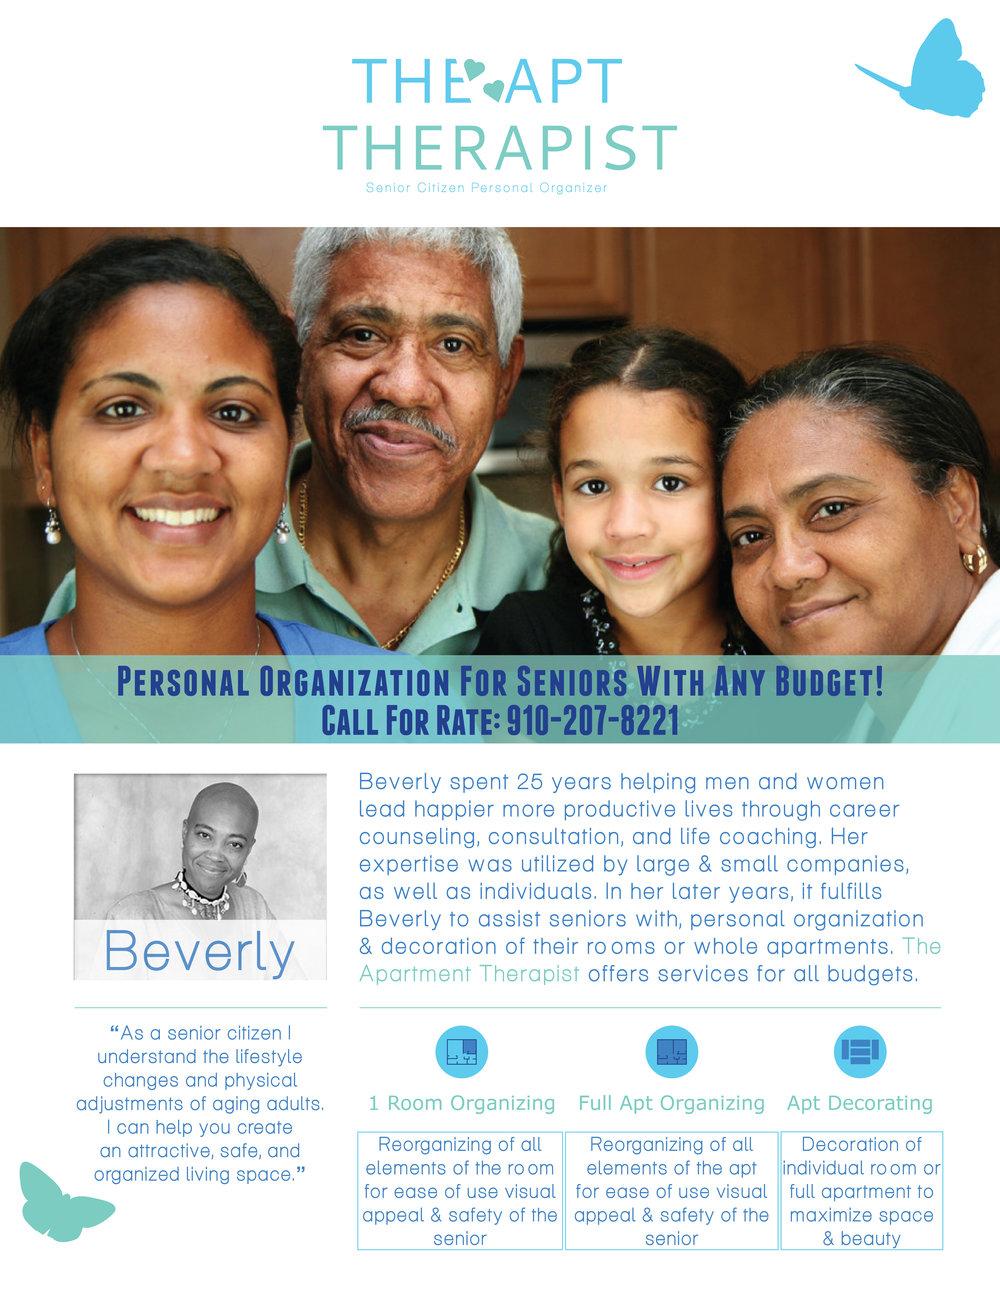 The Apartment Therapist Flyer.jpg